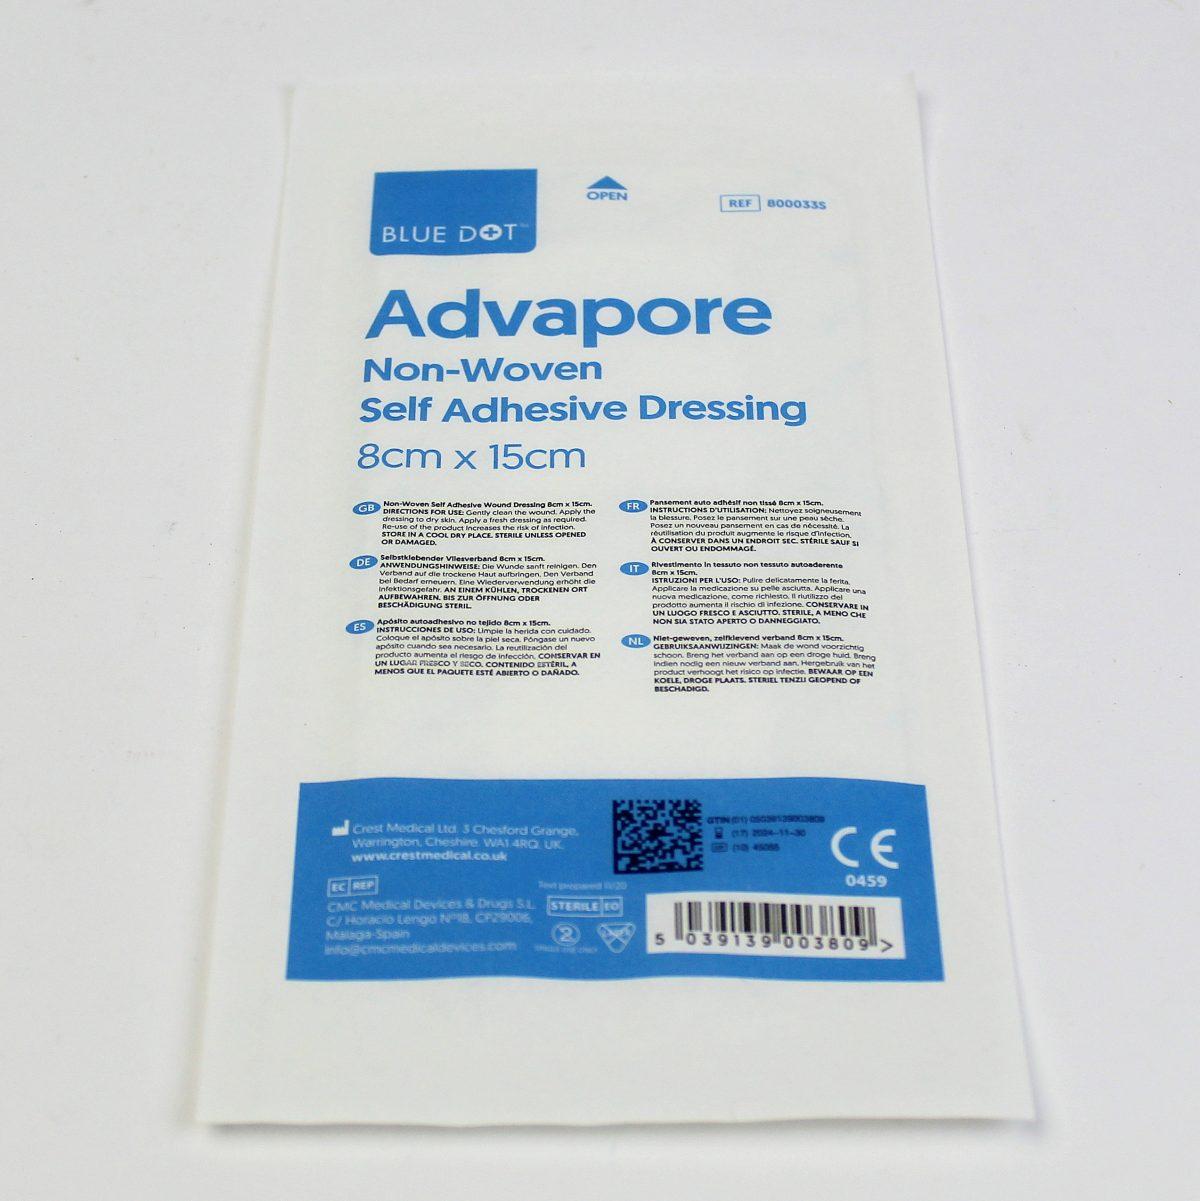 Advapore Dressing